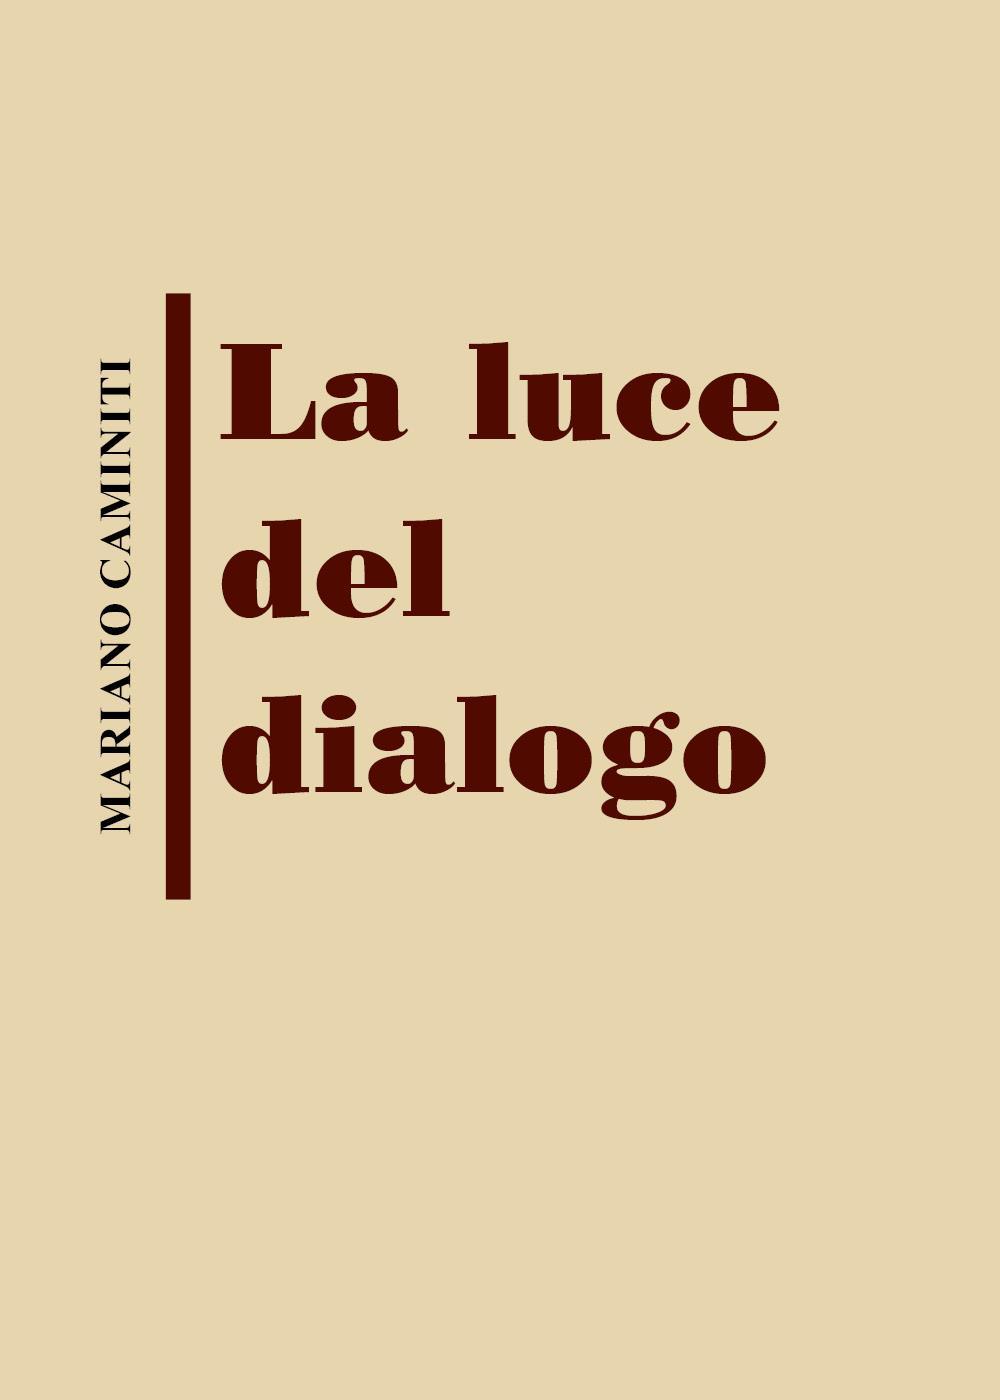 La luce del dialogo